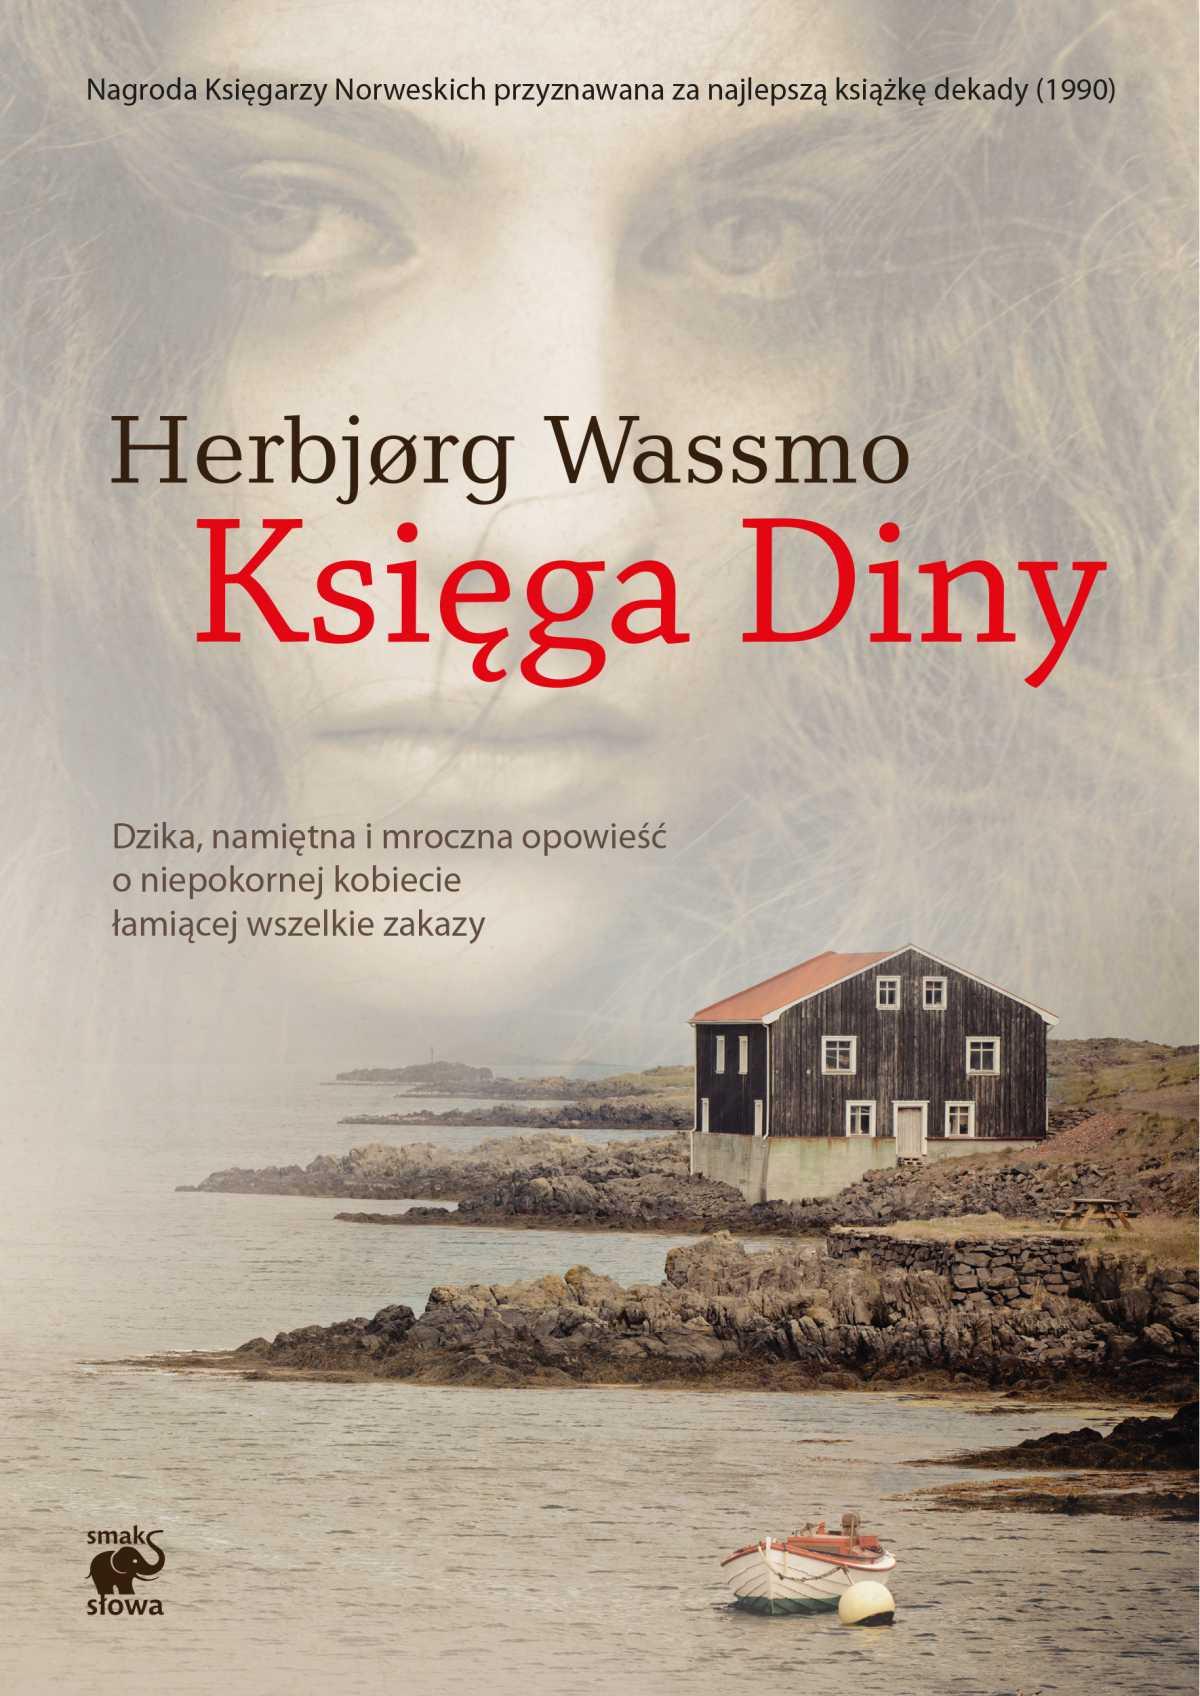 Księga Diny. - Ebook (Książka EPUB) do pobrania w formacie EPUB